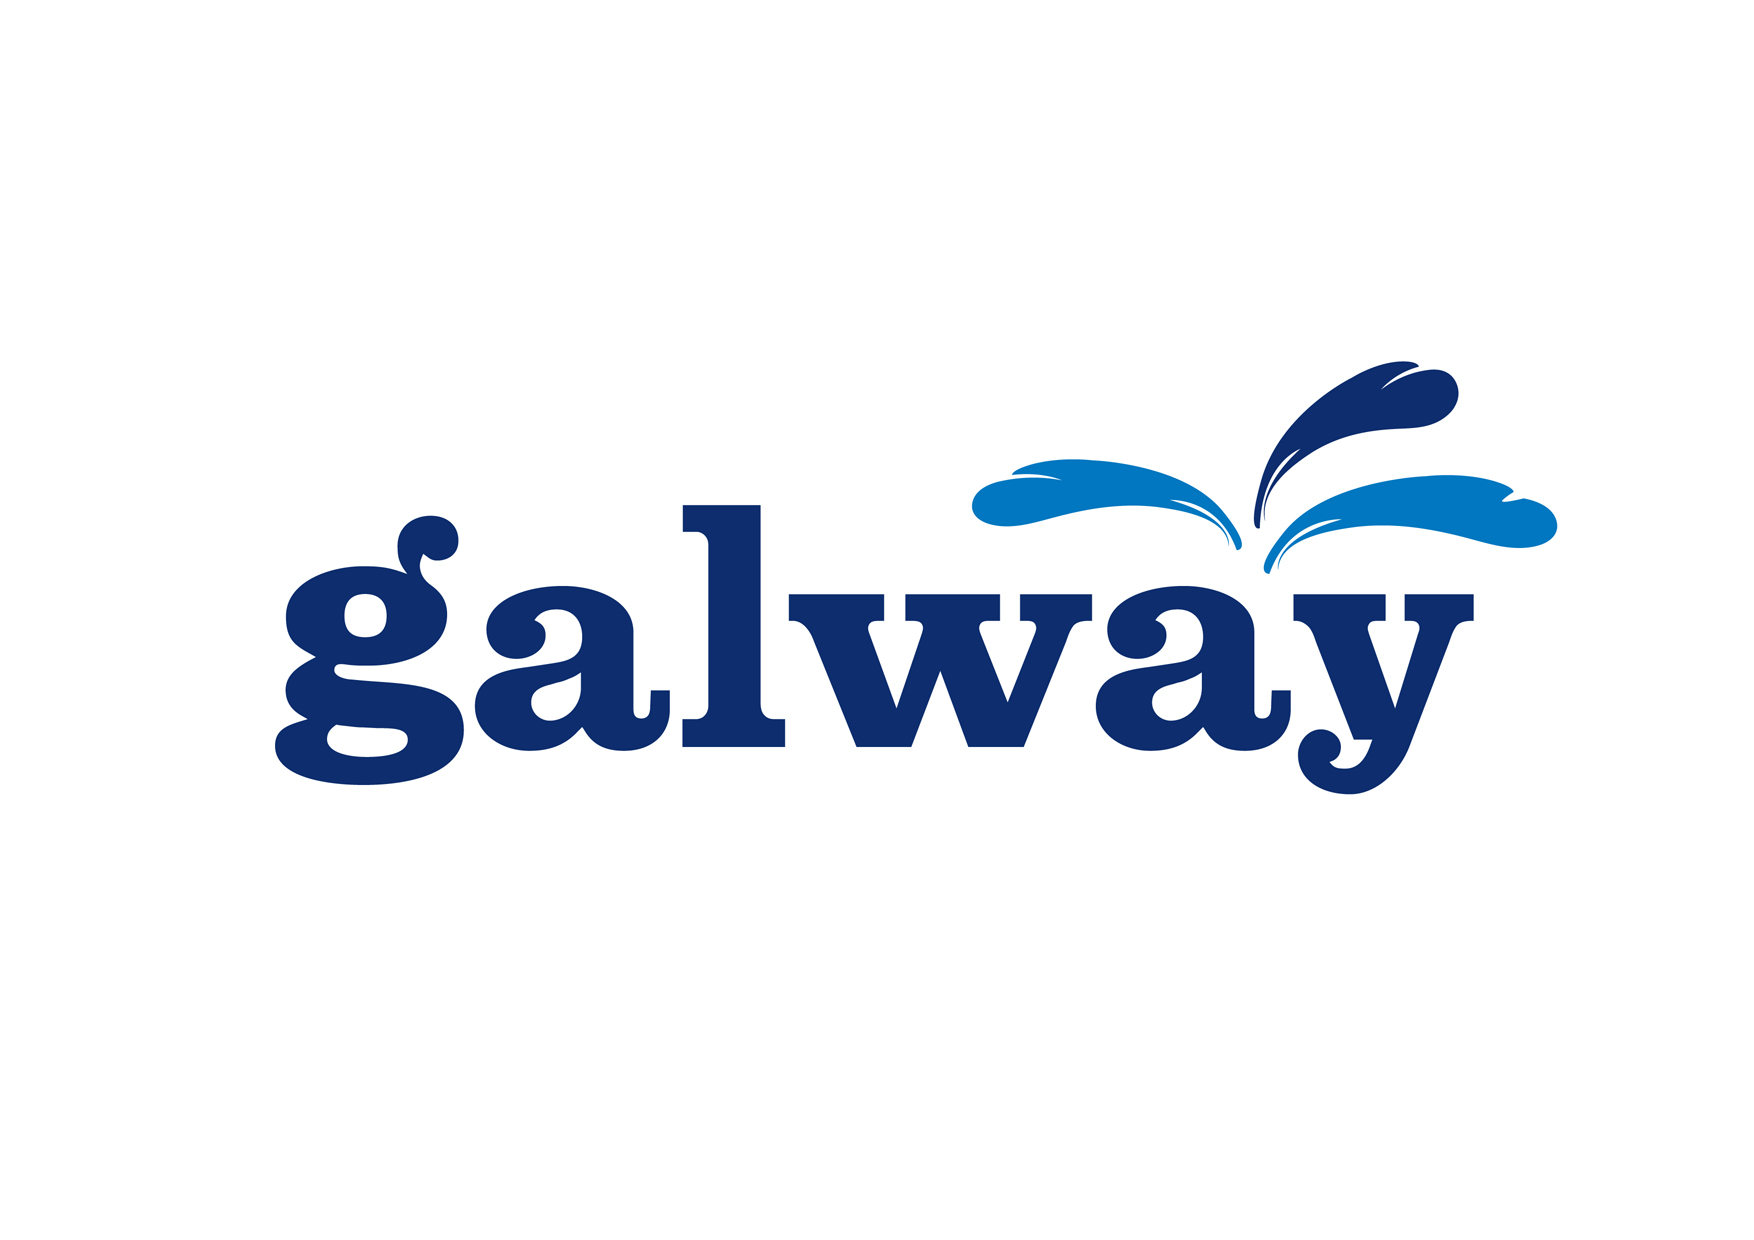 GALWAY WATER LOGO_NAVY.jpg